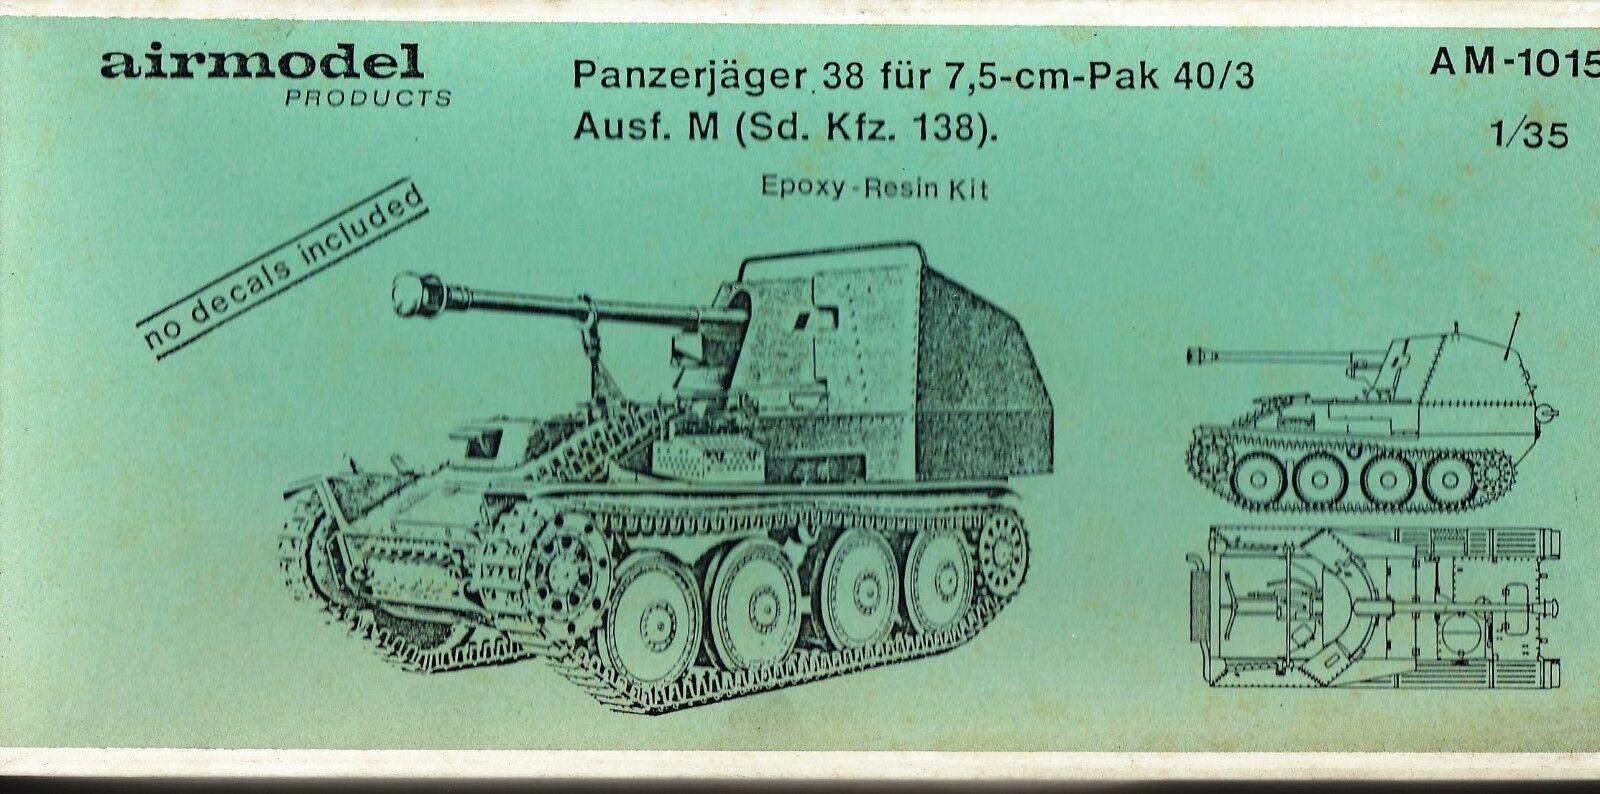 AIRMODEL Products am-1015 - Panzerjager 38 Fur 7,5cm Pak 40 3 Ausf. M 1 35 resin